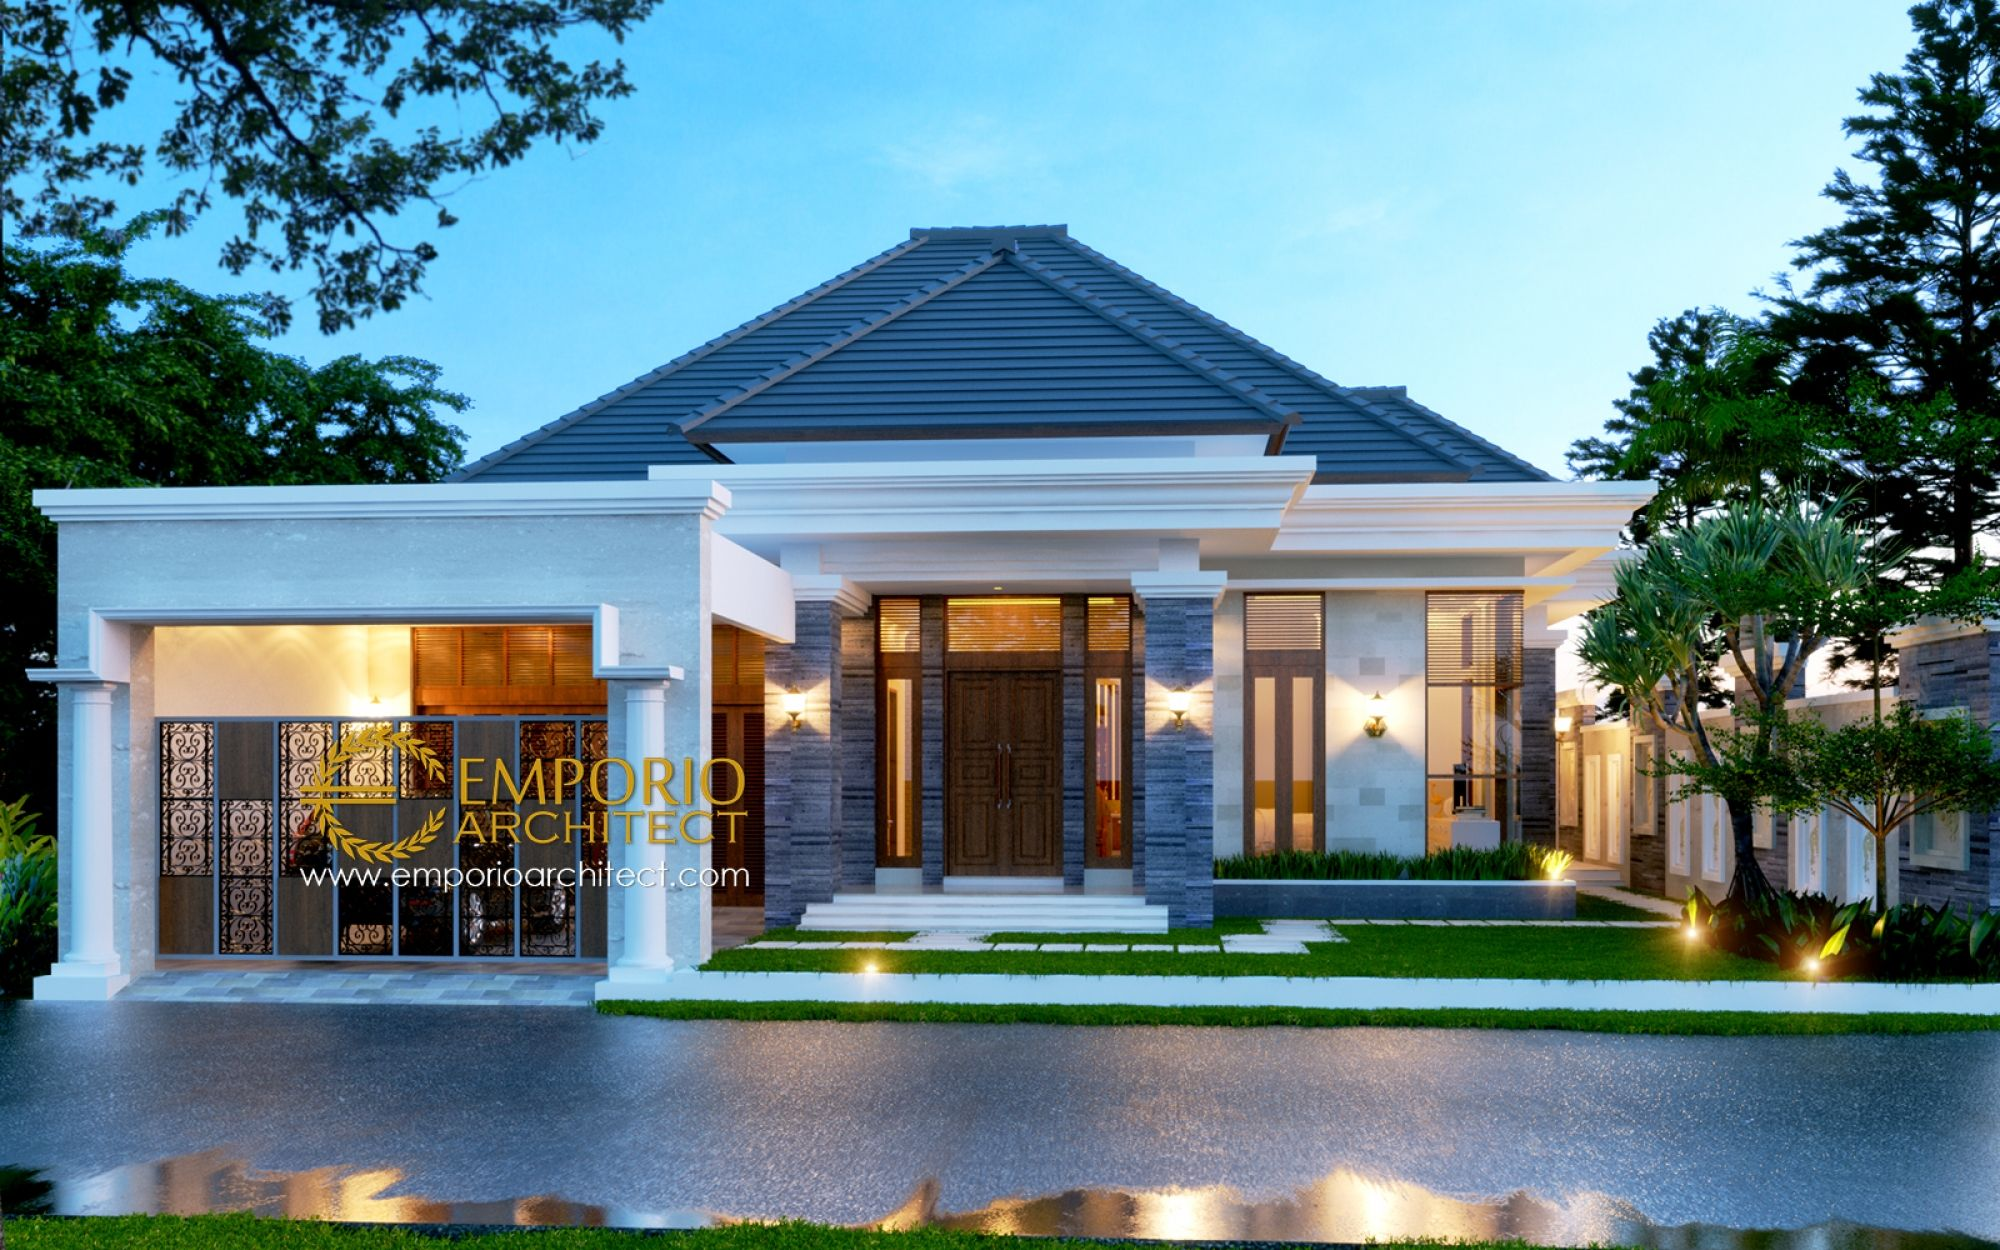 Jasa Arsitek Medan Desain Rumah Bapak Hilman Lubis Jasa Arsitek Desain Rumah Berkualitas Desain Villa Bali Modern Tropis Rumah Arsitektur Arsitek Arsitektur